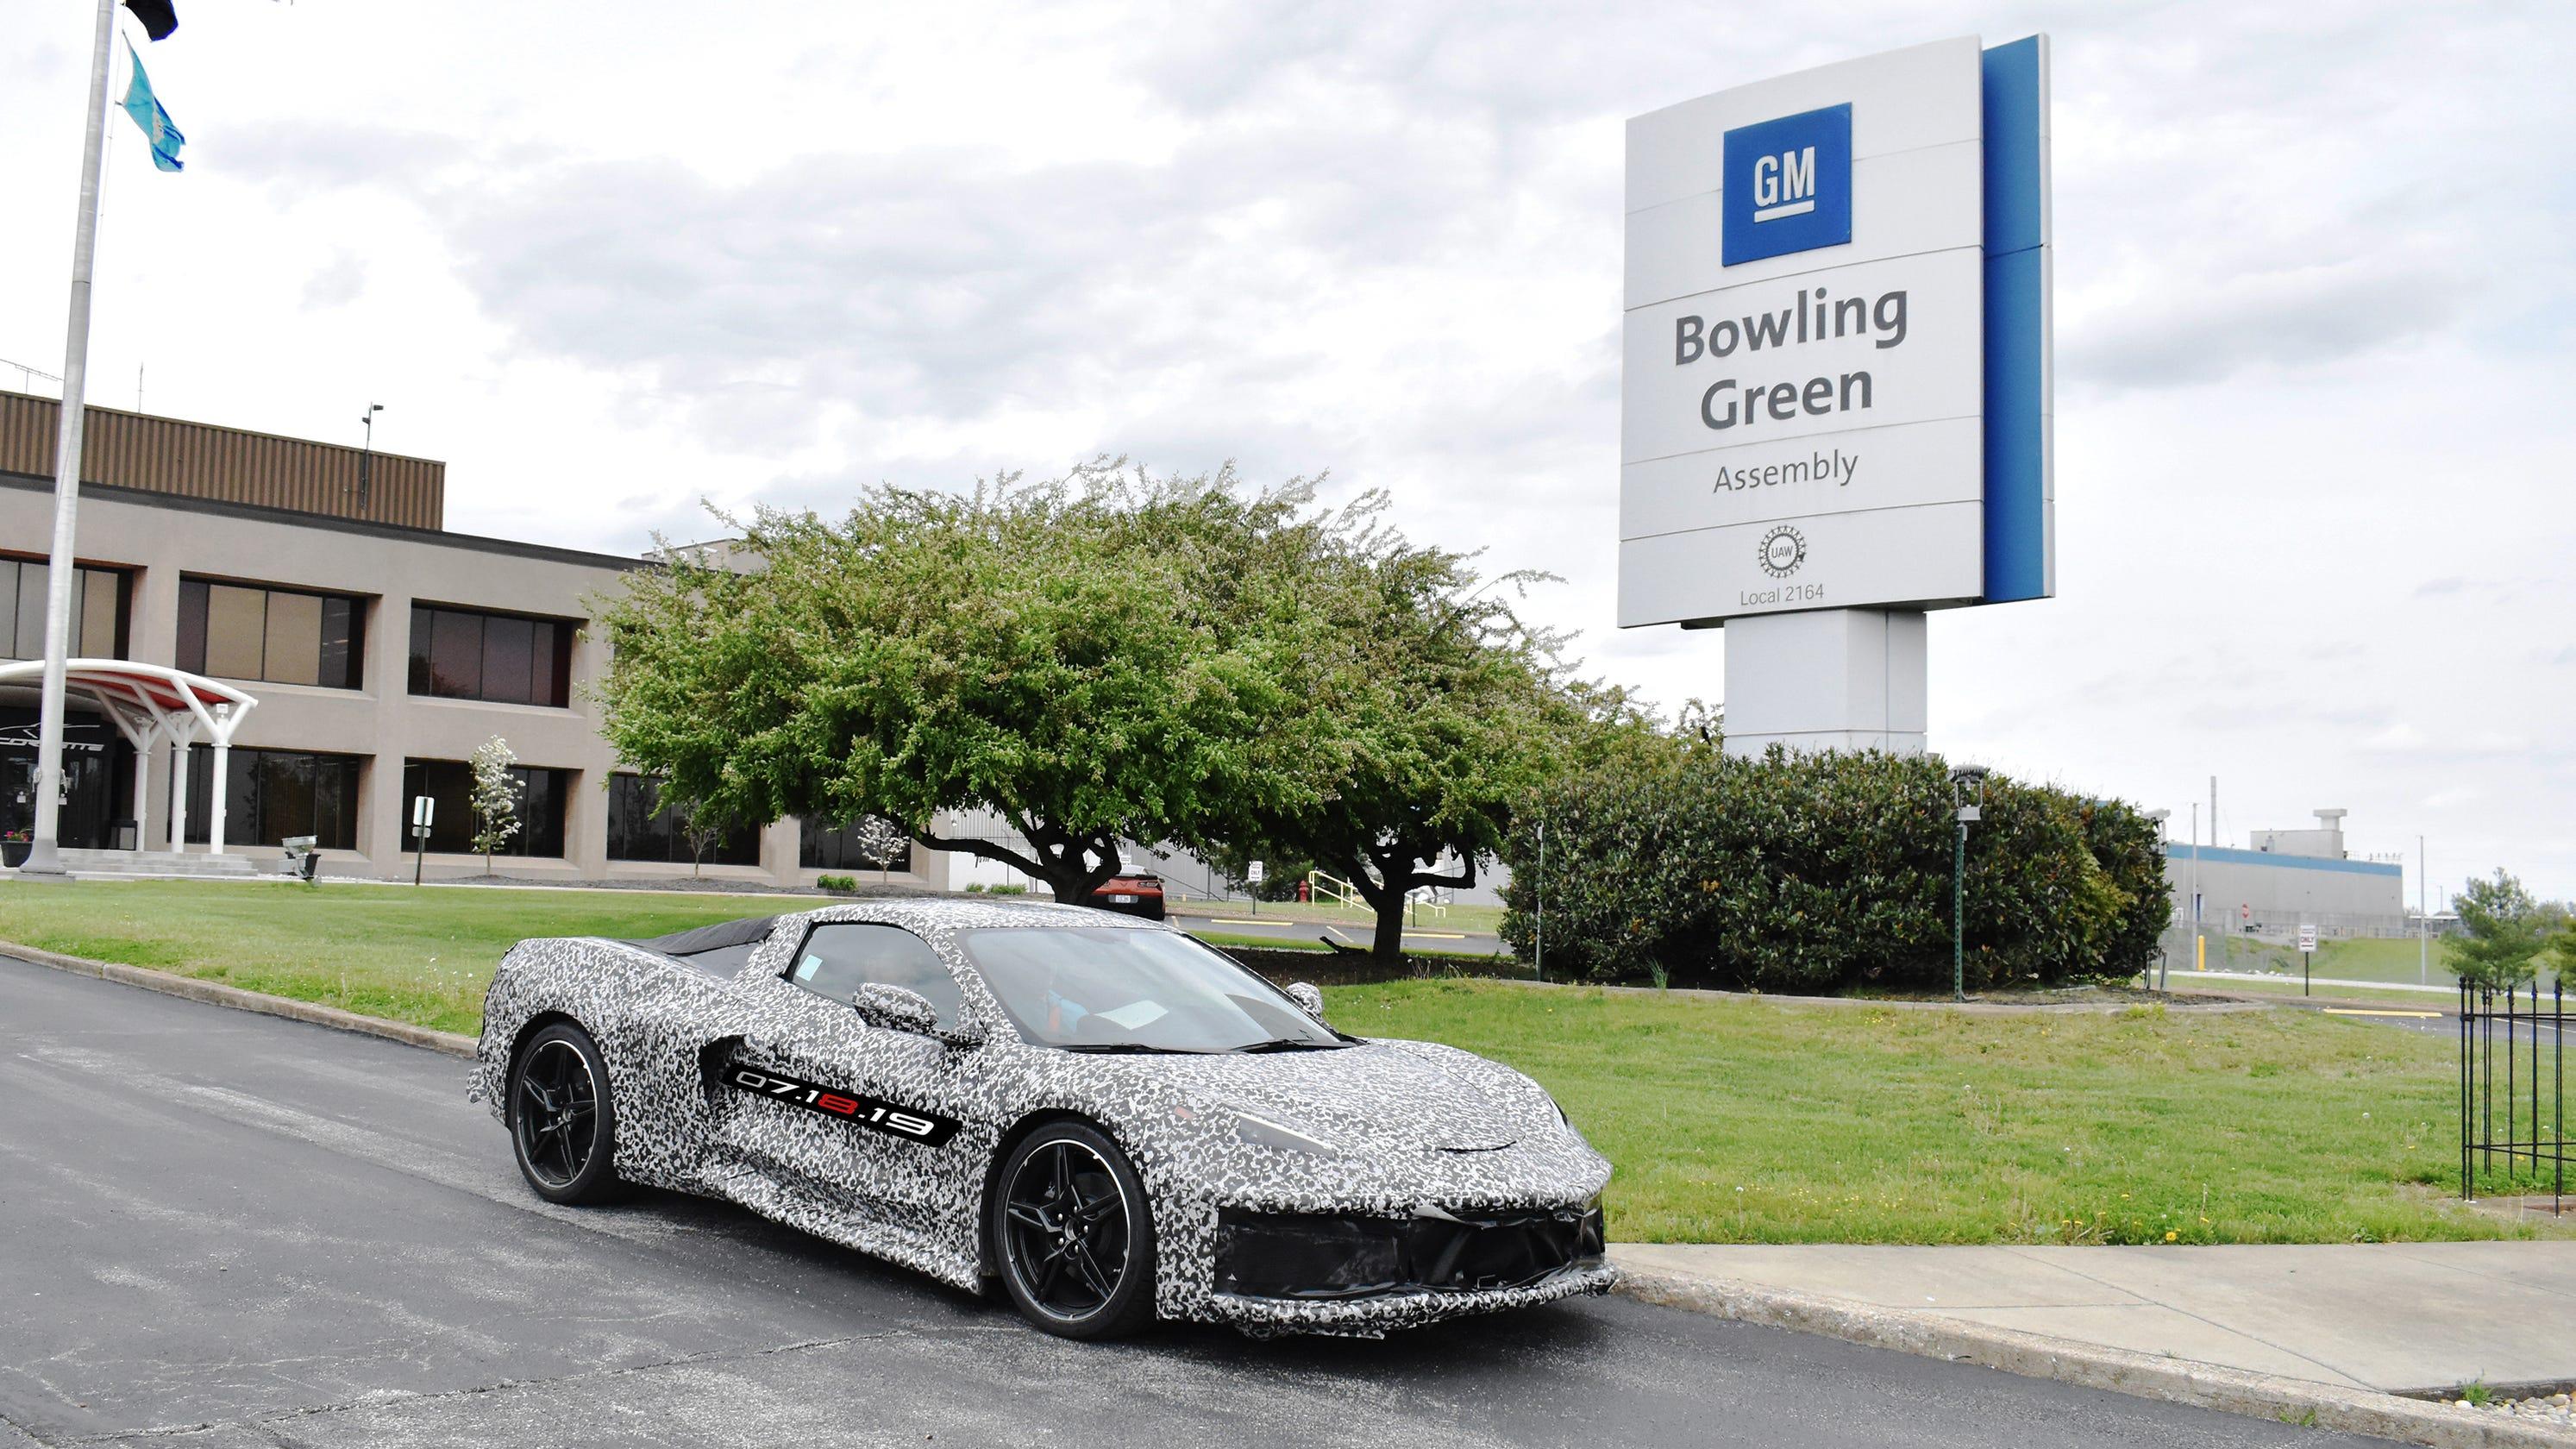 GM adding 400 jobs in Kentucky for mid-engine Corvette